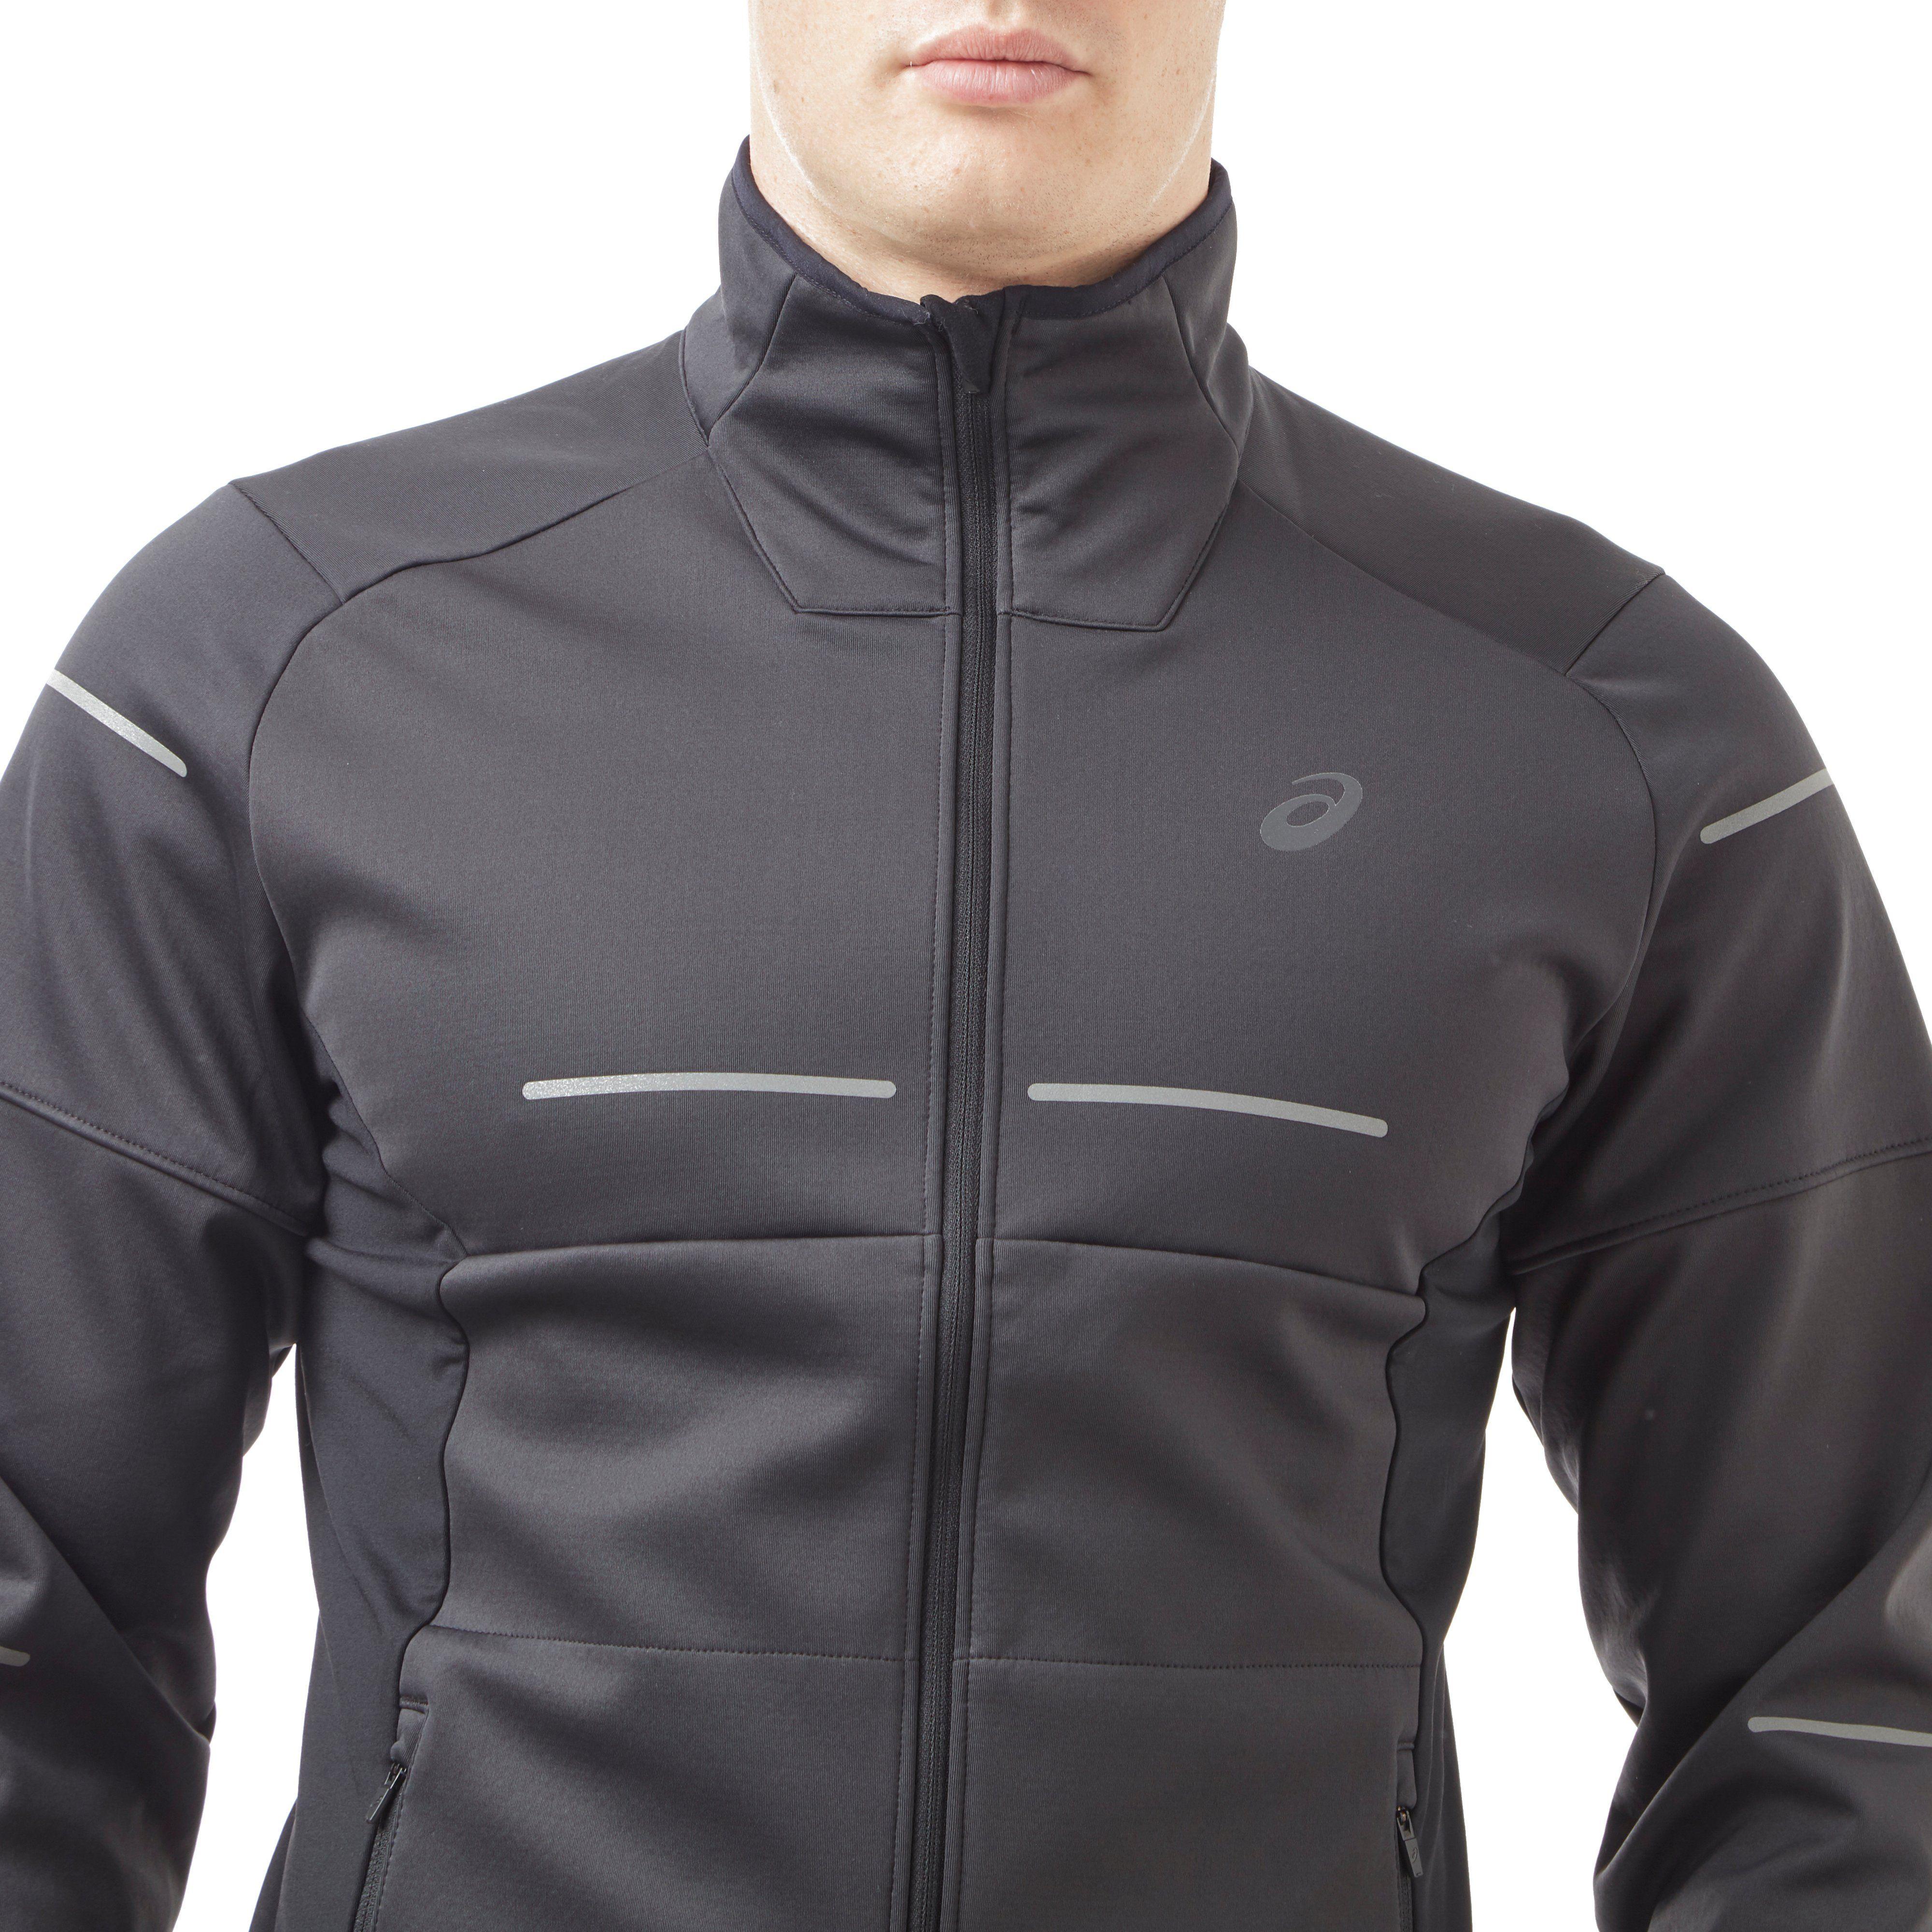 ASICS Lite-Show Winter Men's Running Jacket